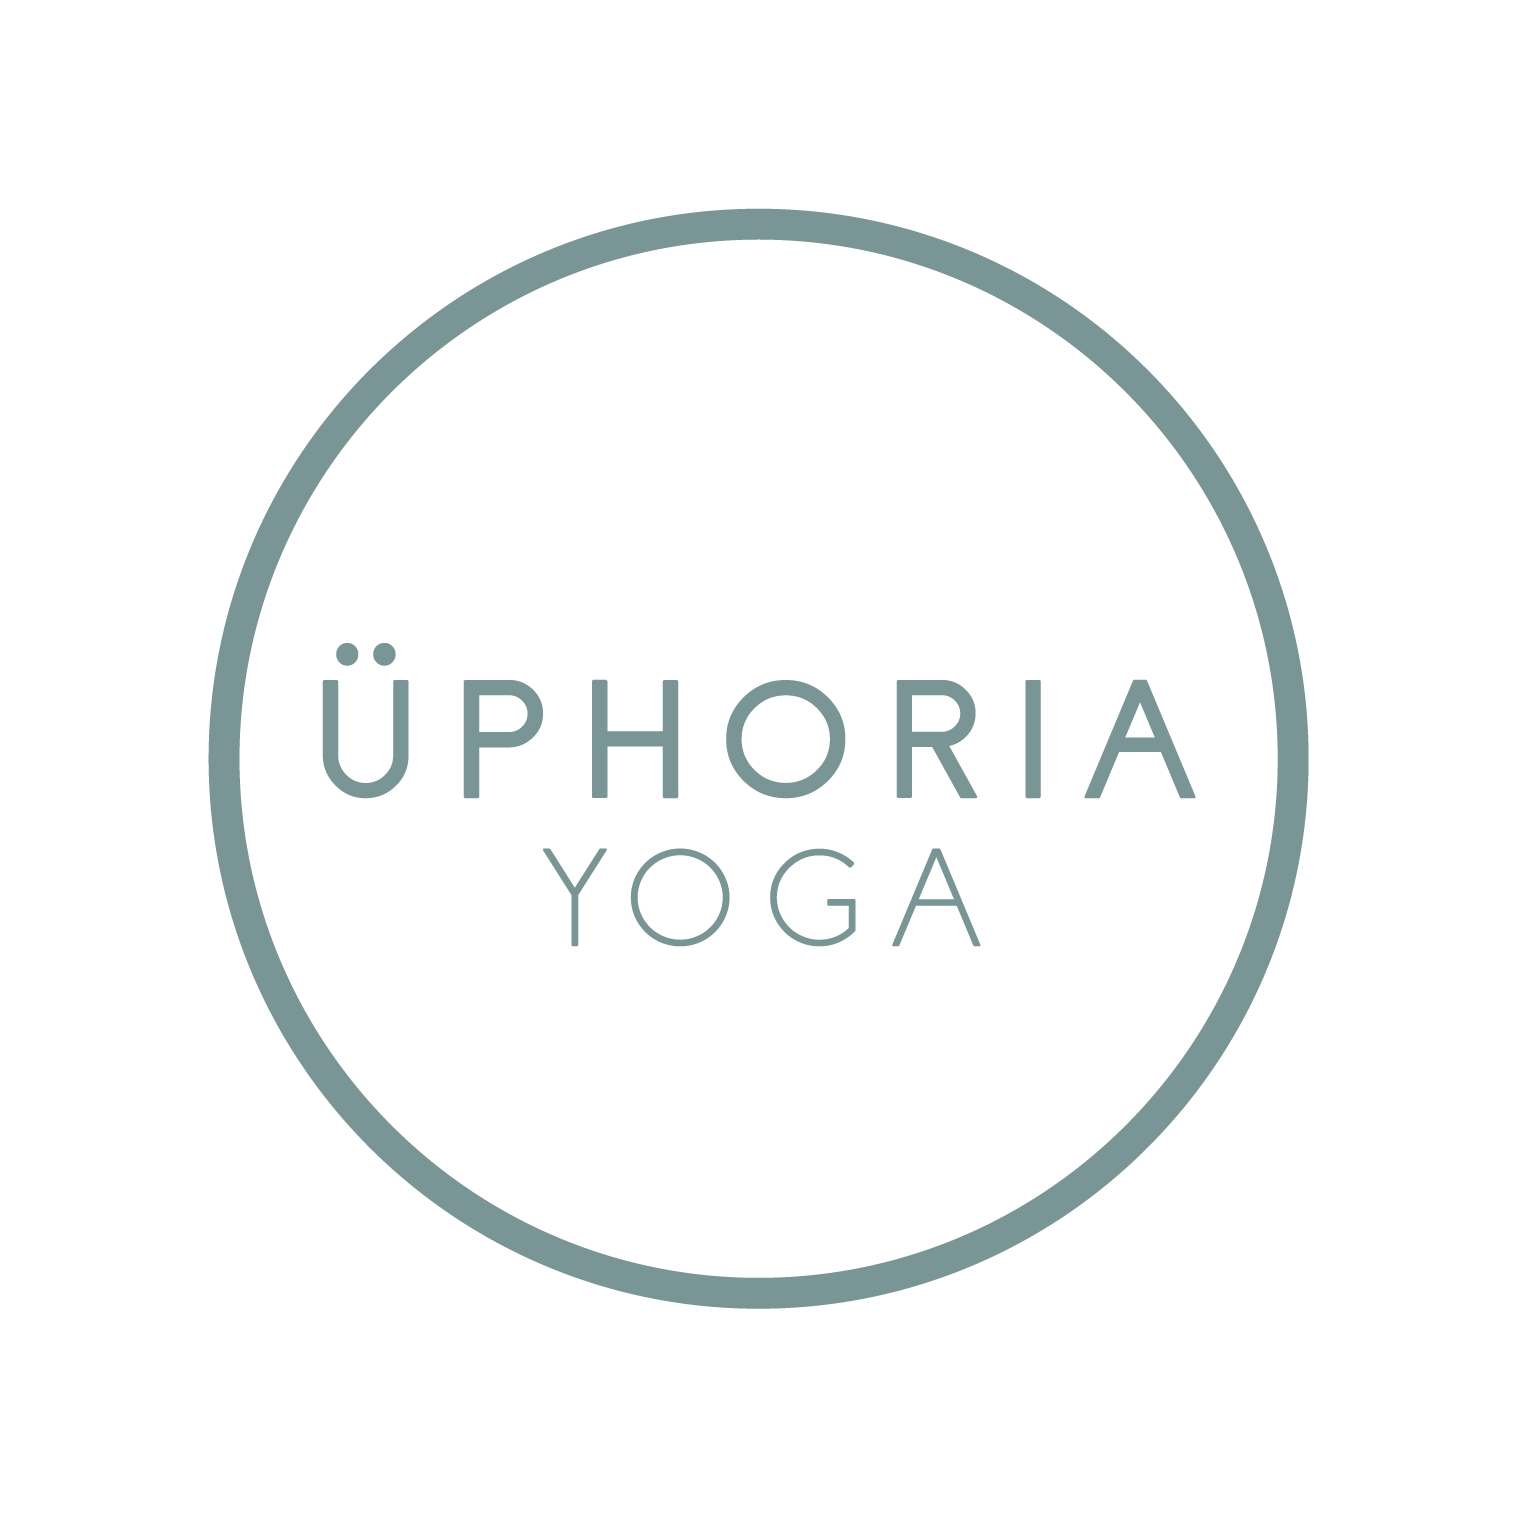 Uphoria Yoga